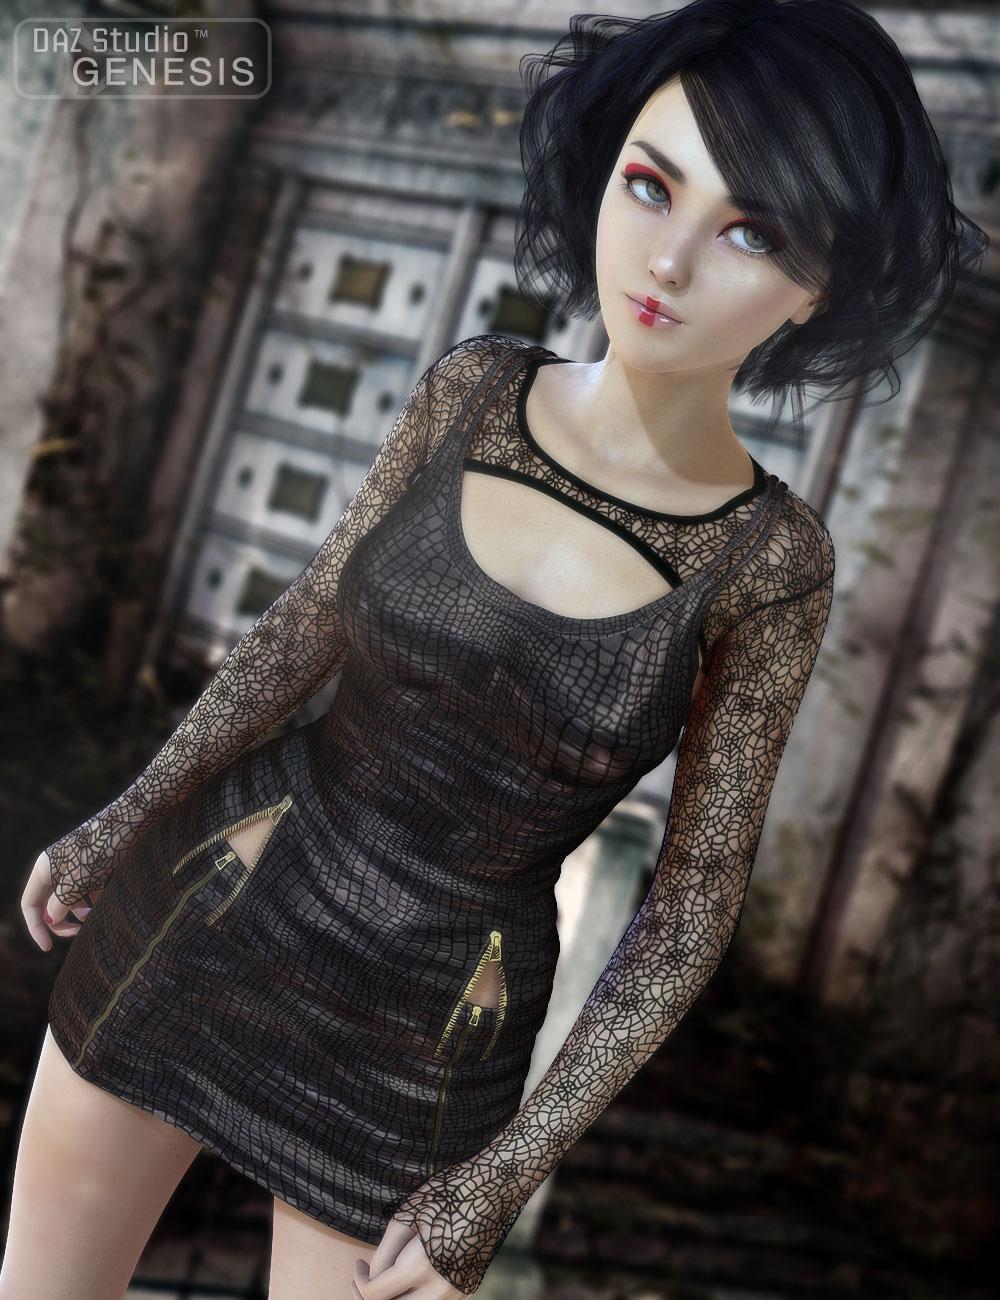 Goth Chick by: 4blueyes, 3D Models by Daz 3D